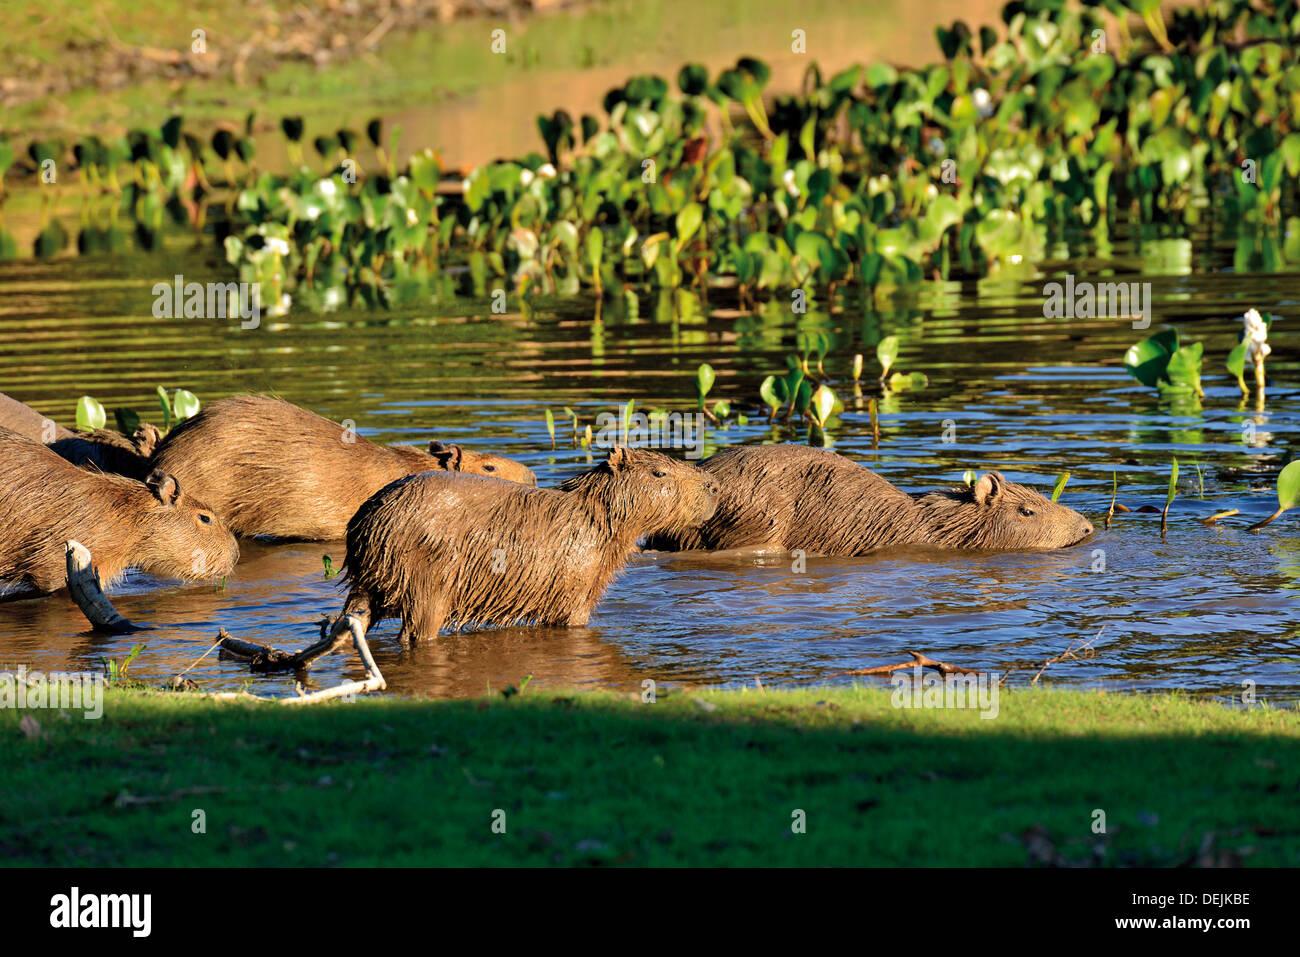 Brazil, Pantanal: Family of Capybaras (Hydrochoerus hydrochaeris) entering in the water - Stock Image